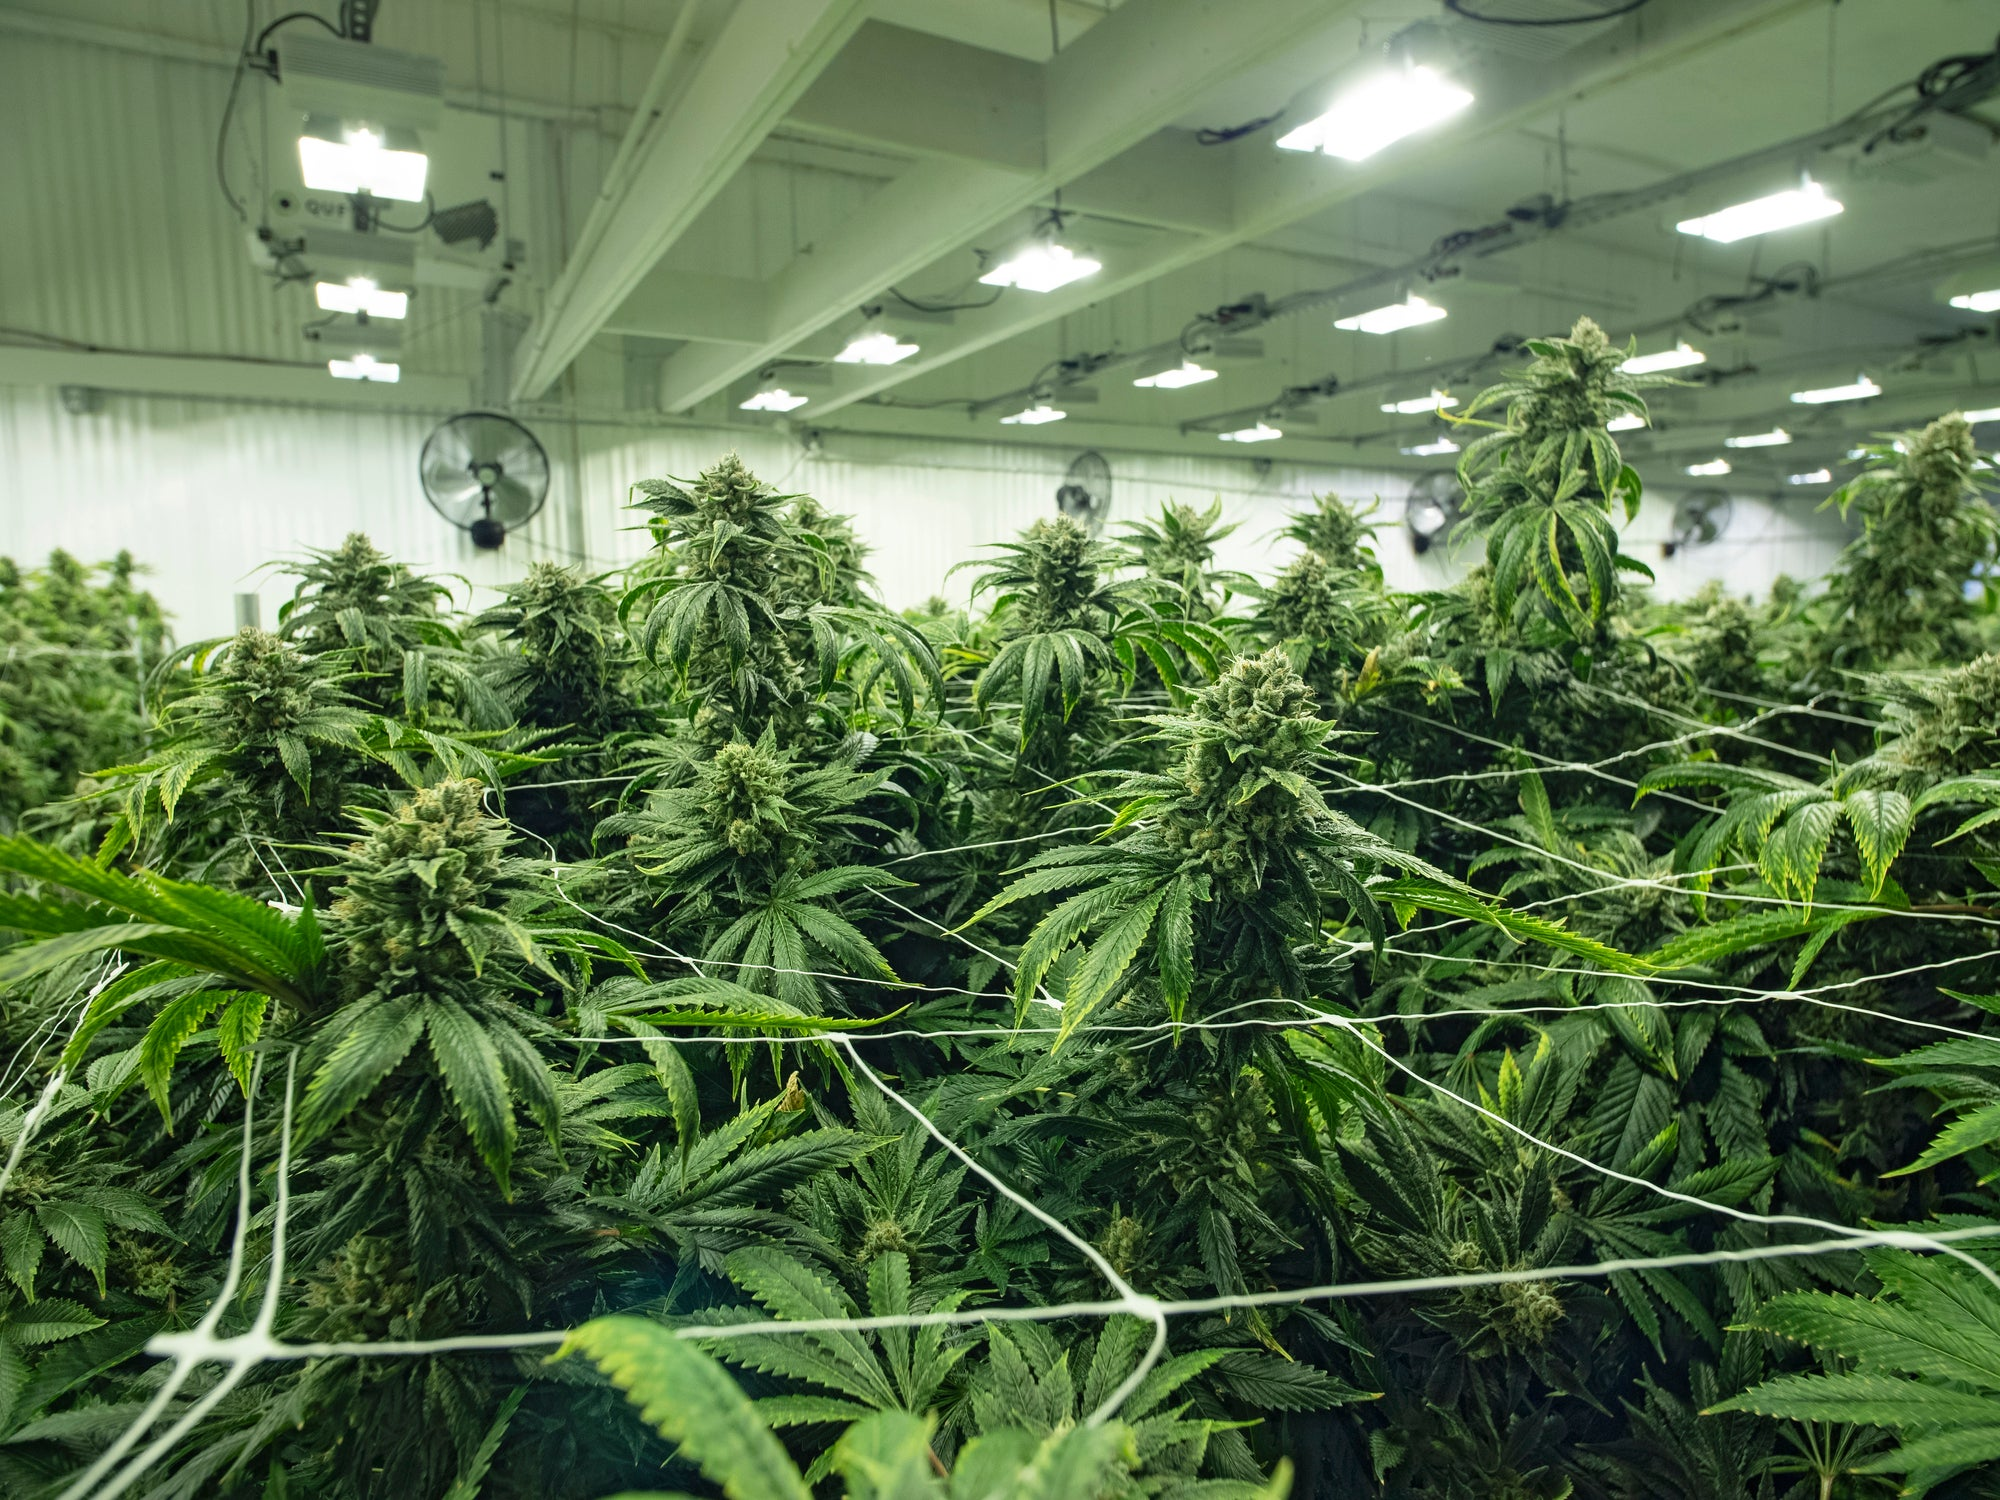 Cannabis plants in an indoor grow facility.